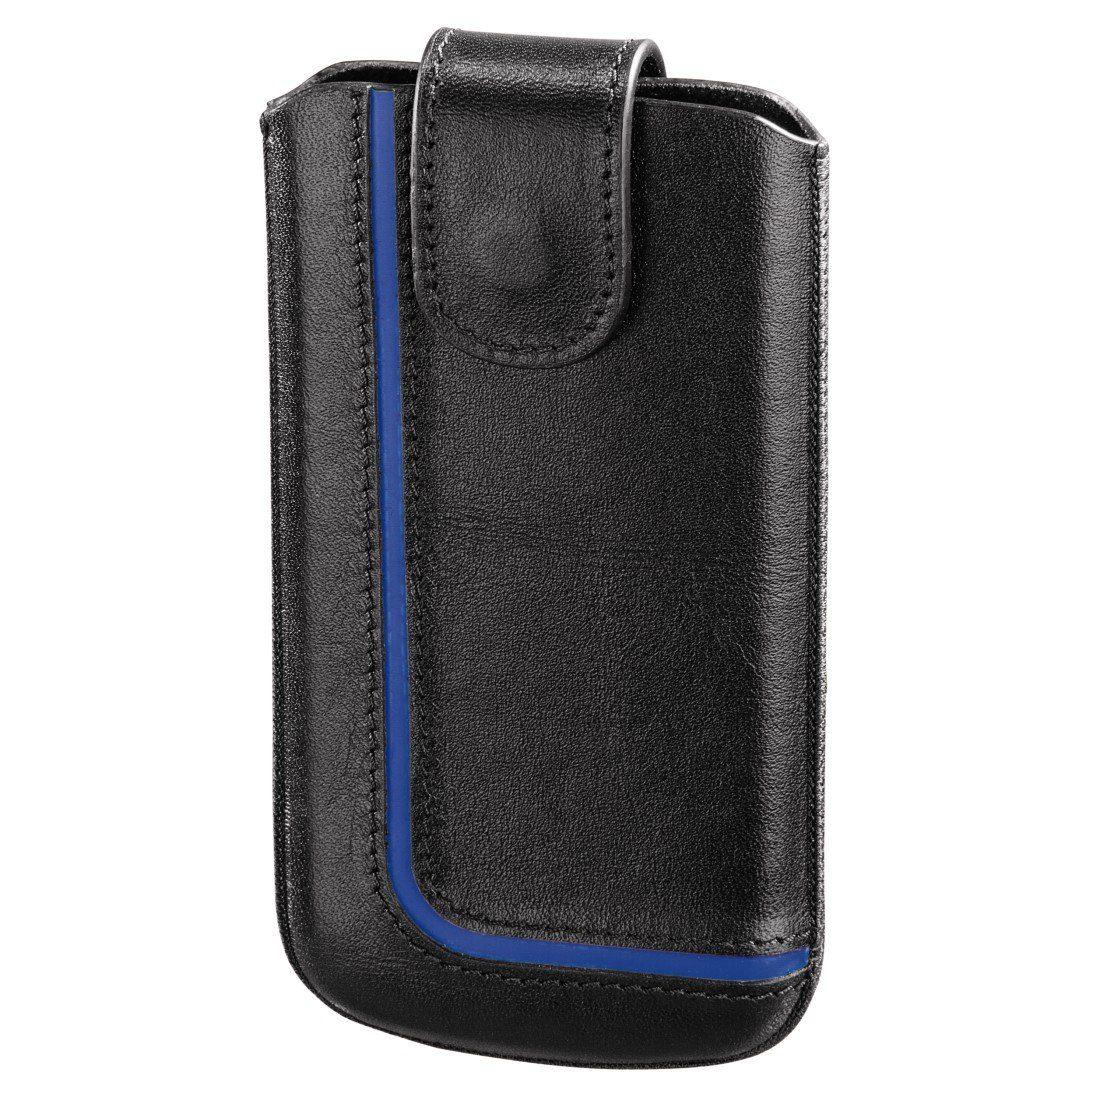 Hama Handy-Sleeve Neon Black, Gr. L, Schwarz/Blau